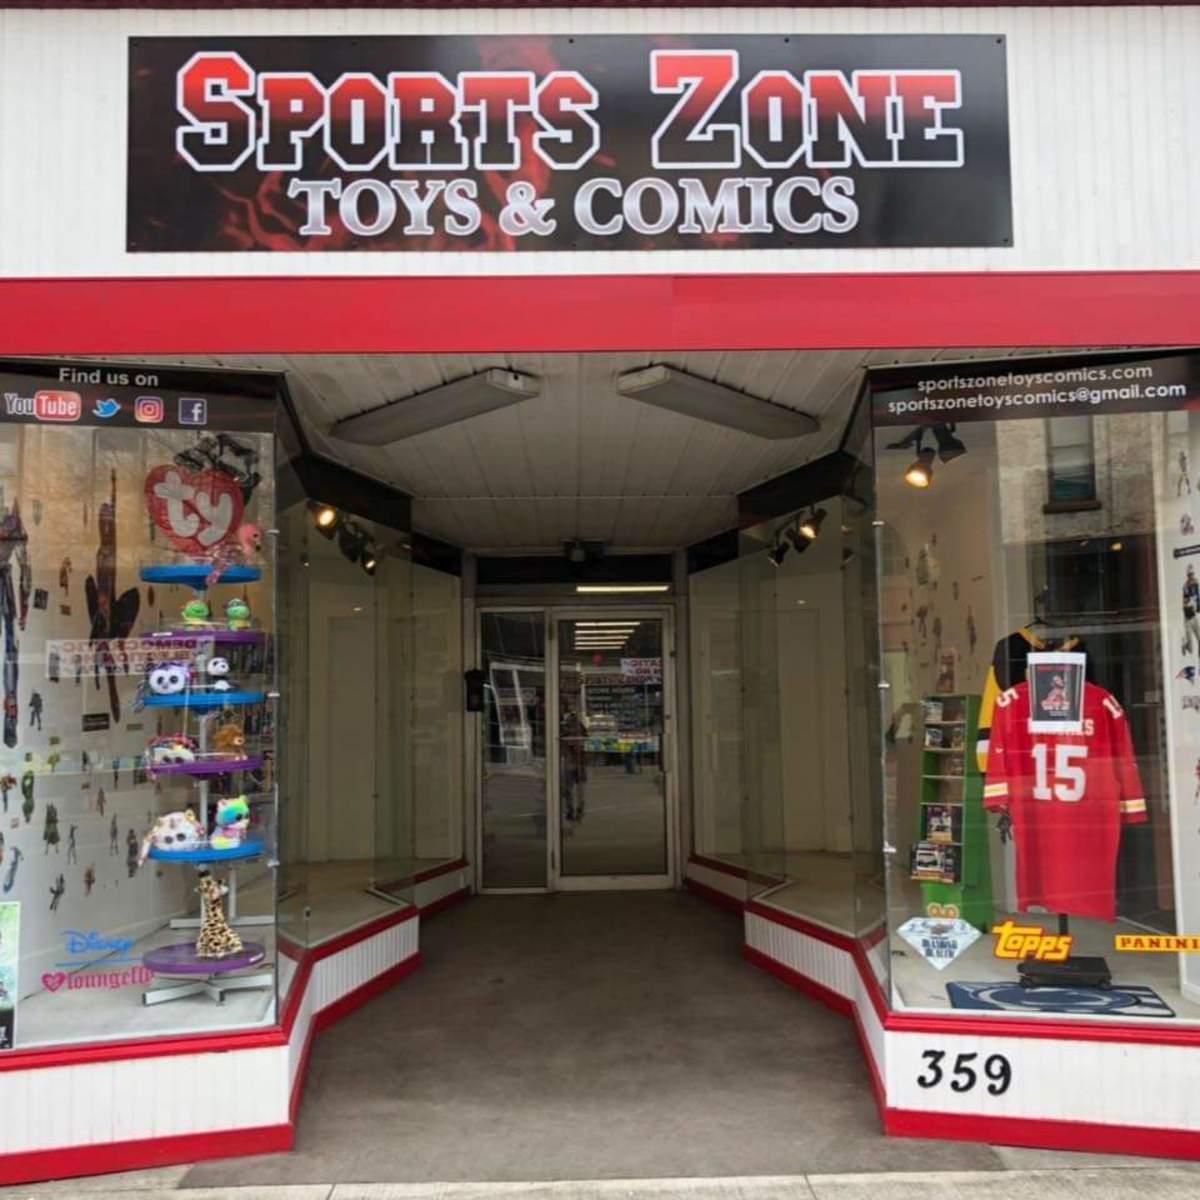 Sports Zone Toys & Comics in Sunbury, Pa.